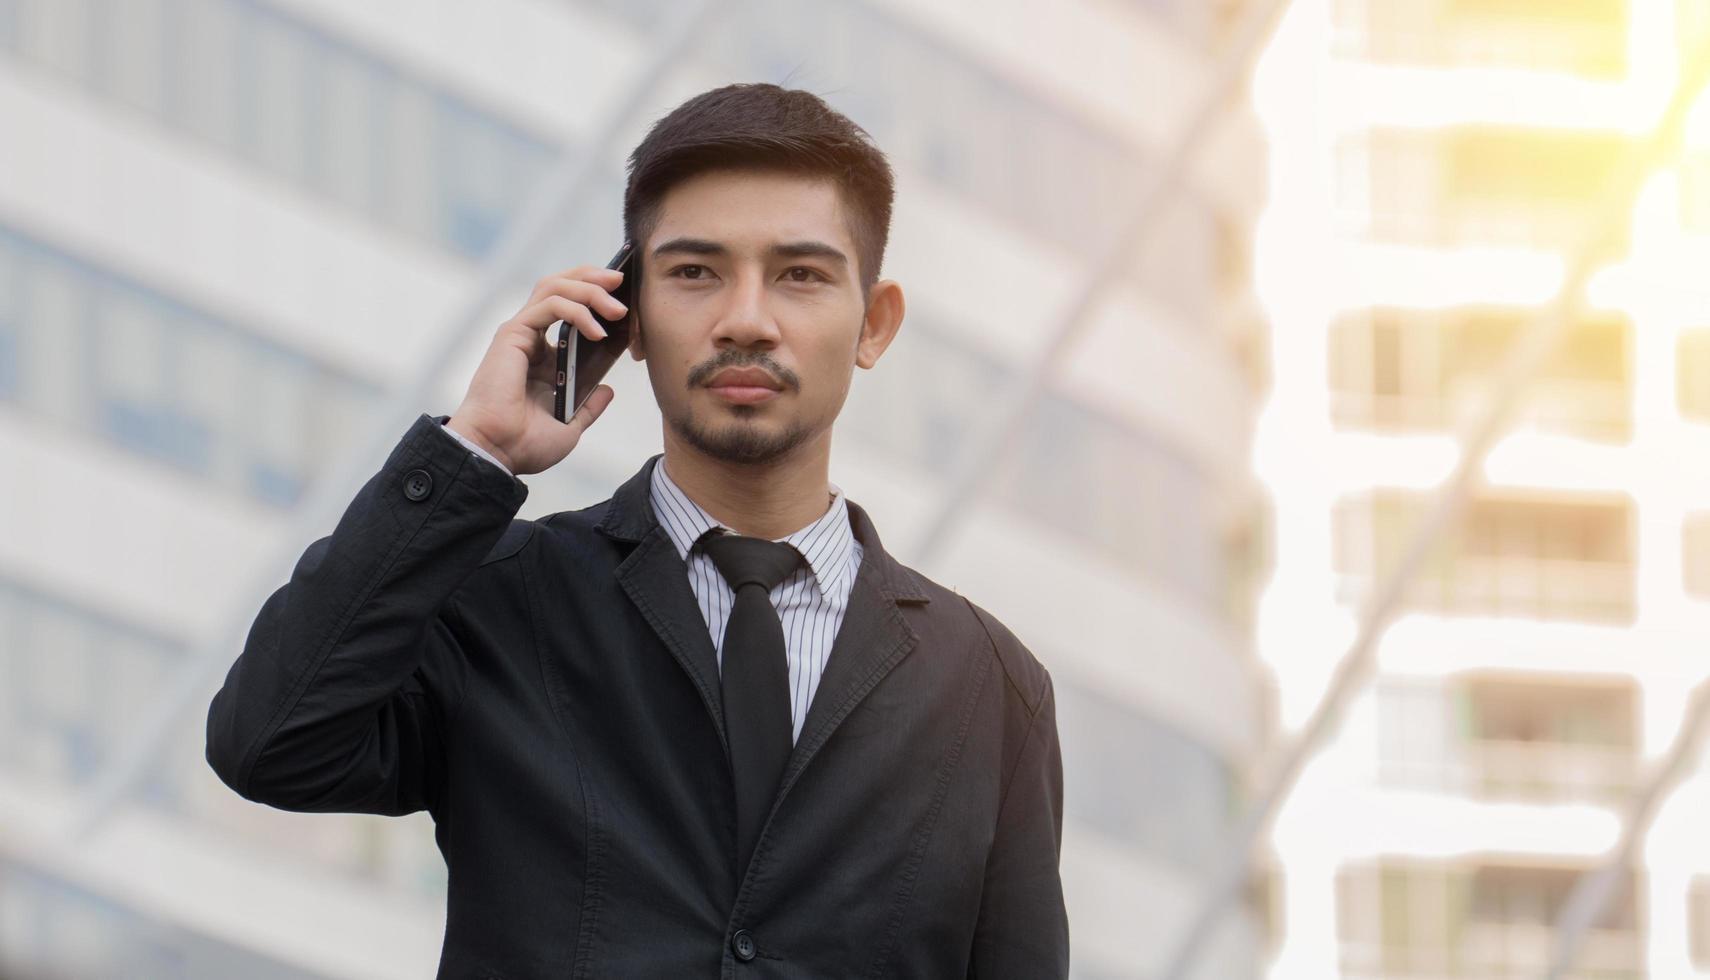 Aziatische zakenman praten over de telefoon foto